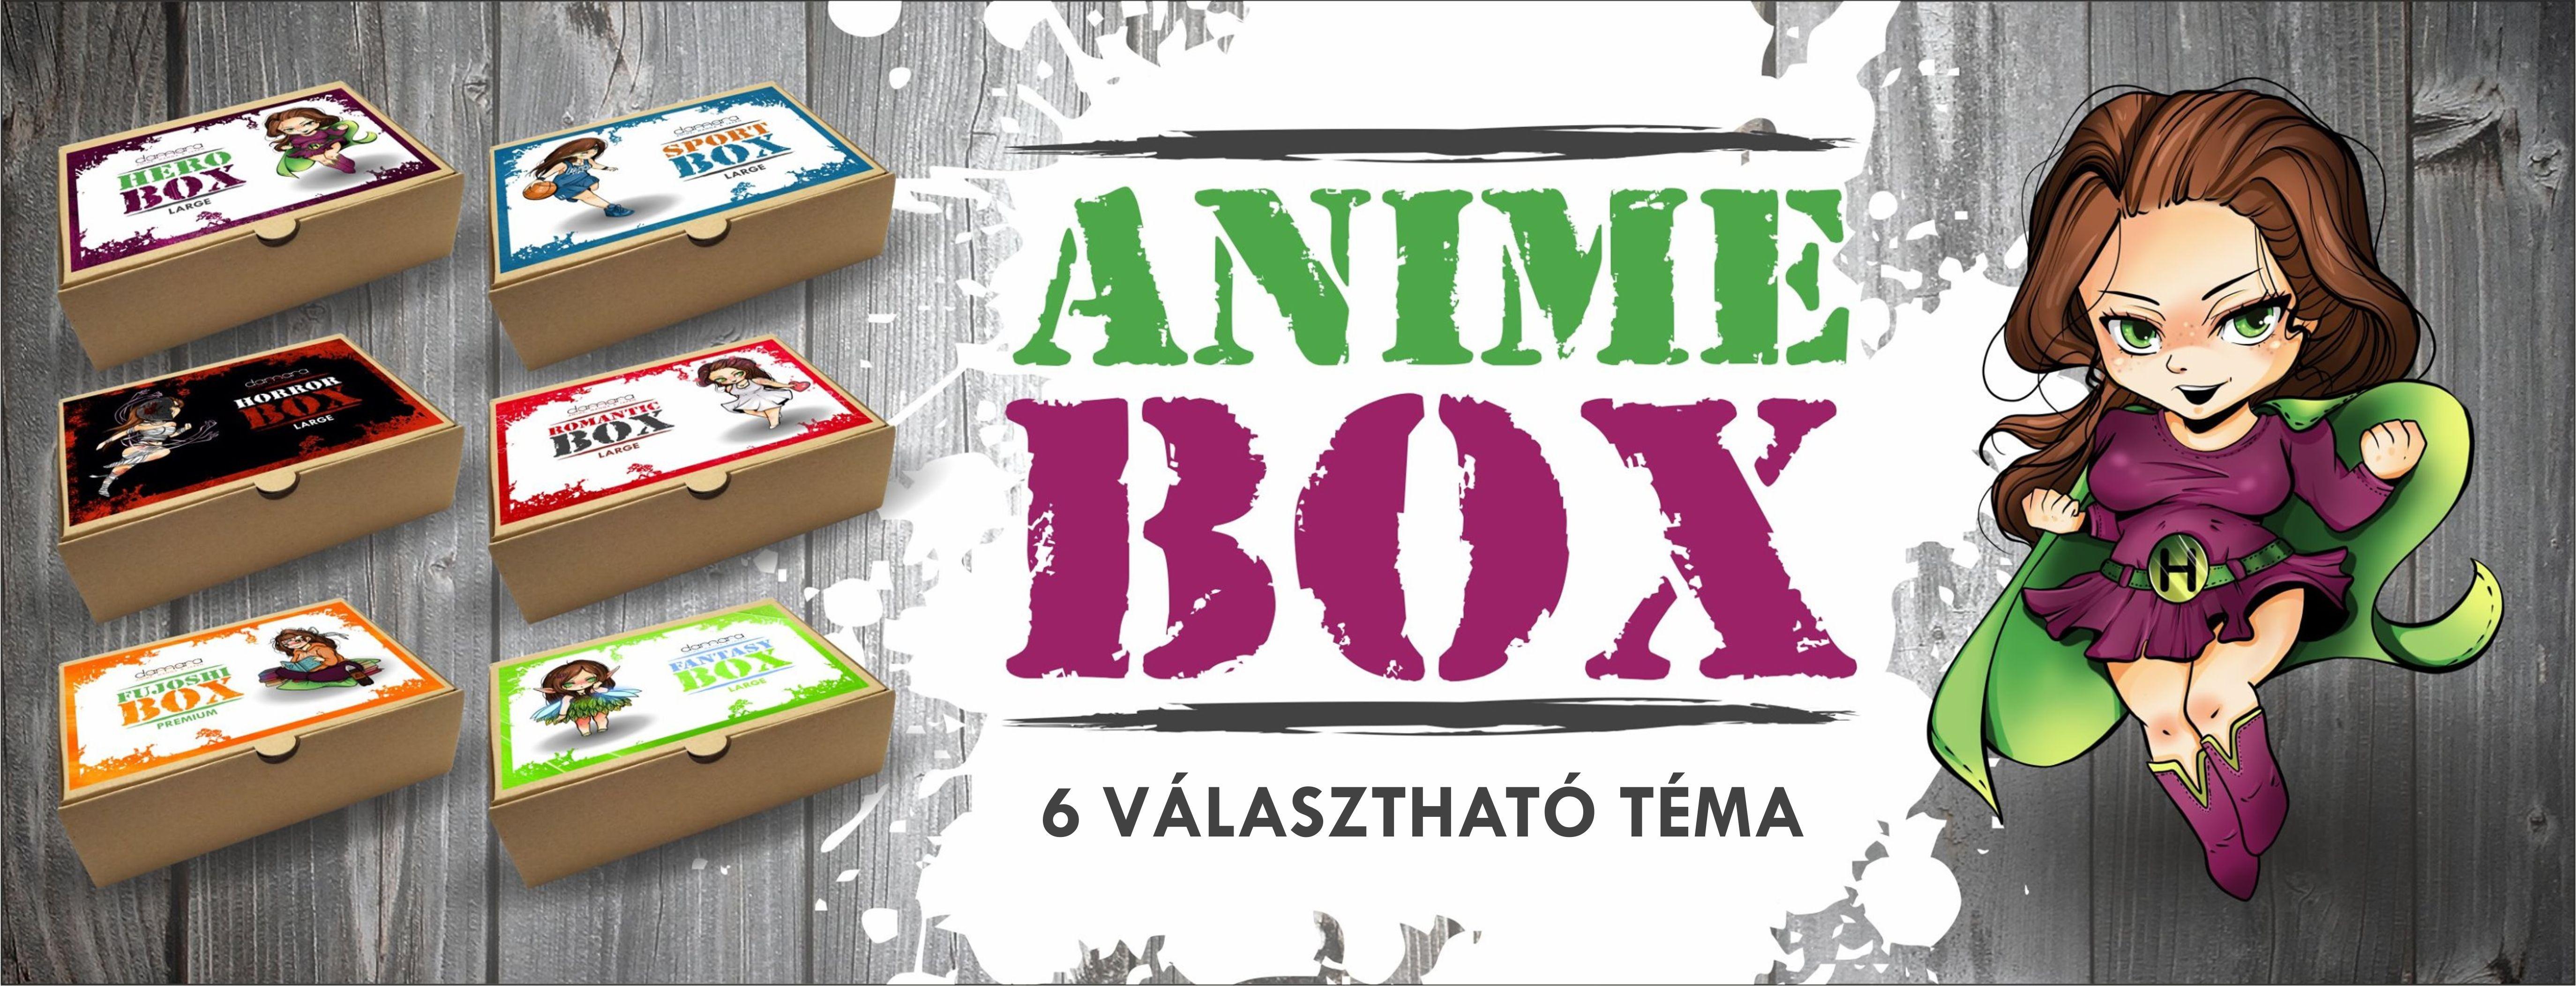 otaku BOX